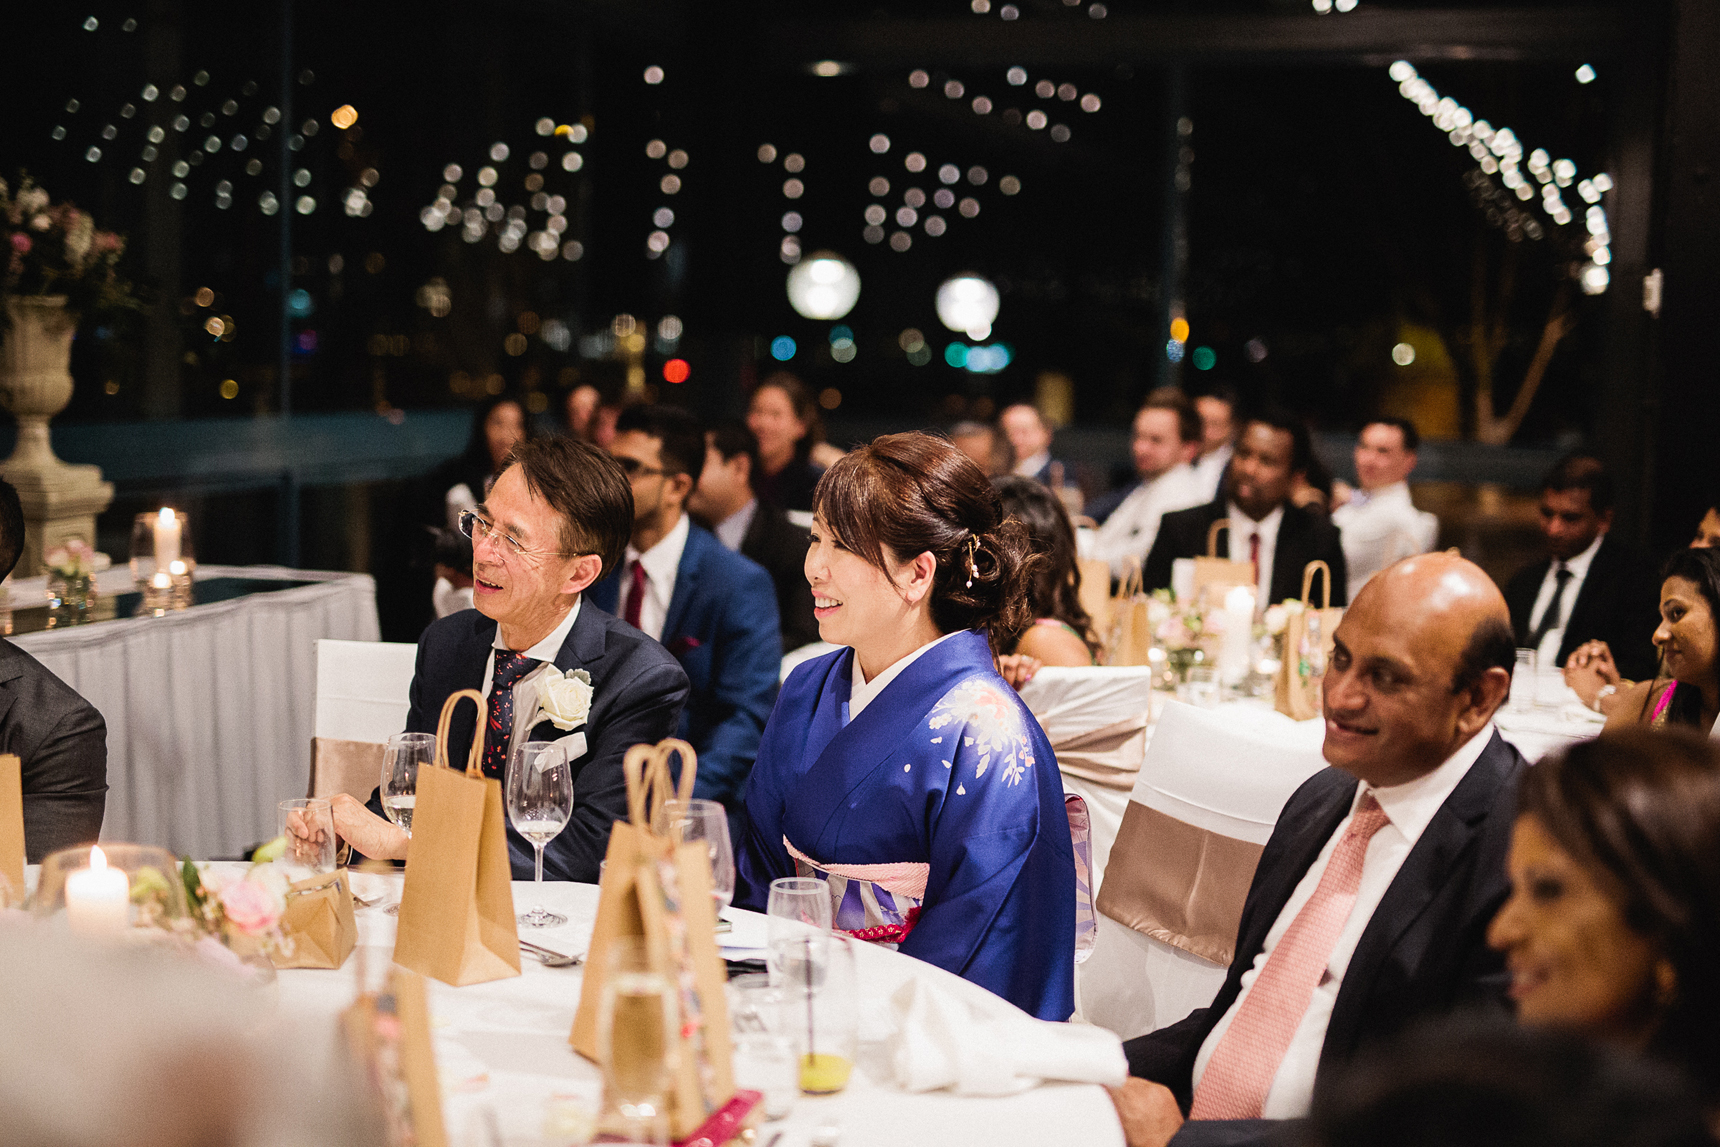 MJ_Pier_One_Sydney_Wedding_Photographer056.jpg